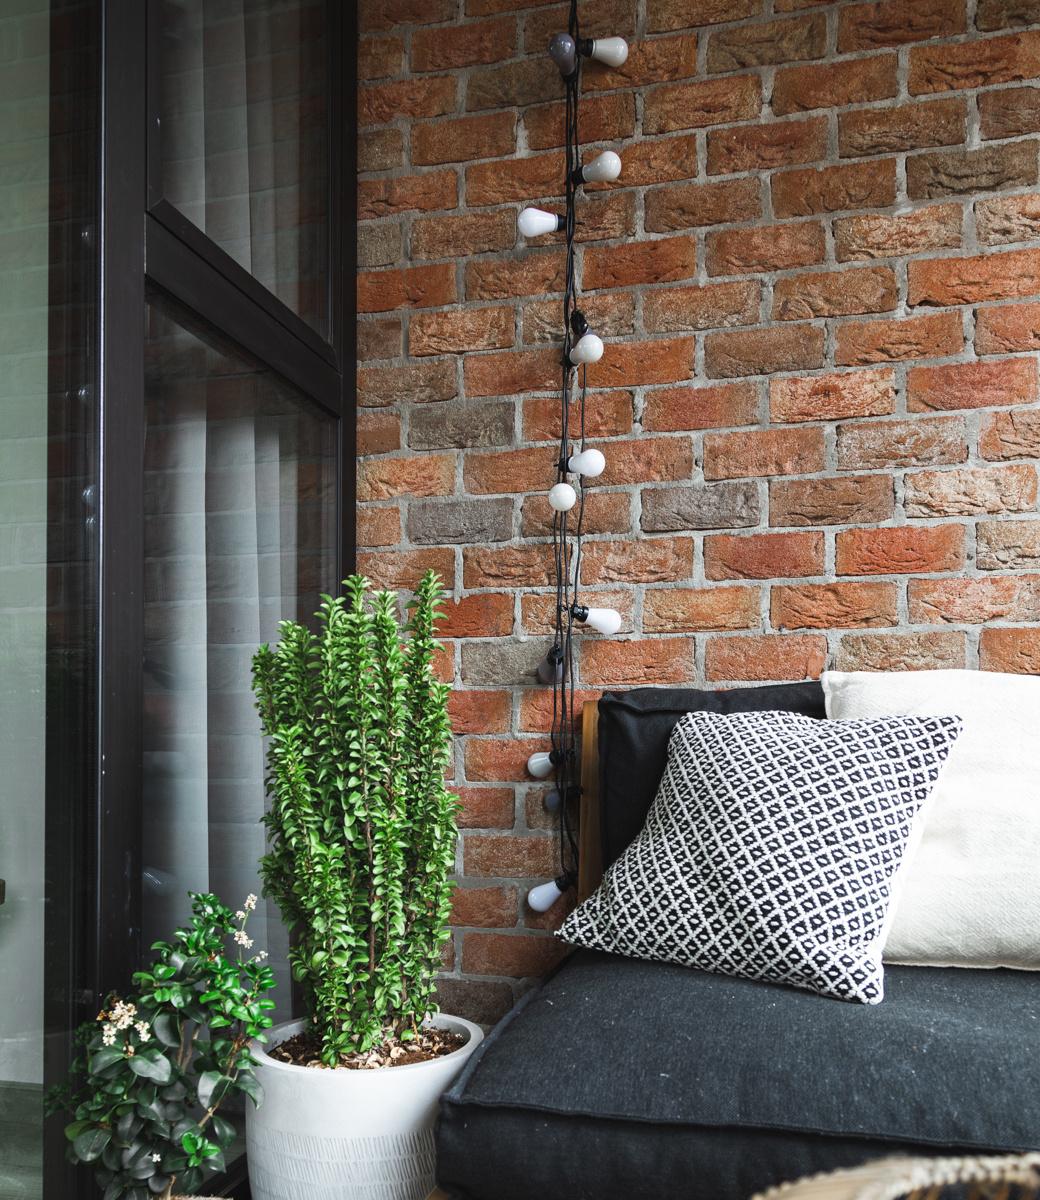 LEDR buiten feestverlichting grijs - Outdoor Patio Lichtslinger Antra - 10 LED lampen- Edison Bulbs